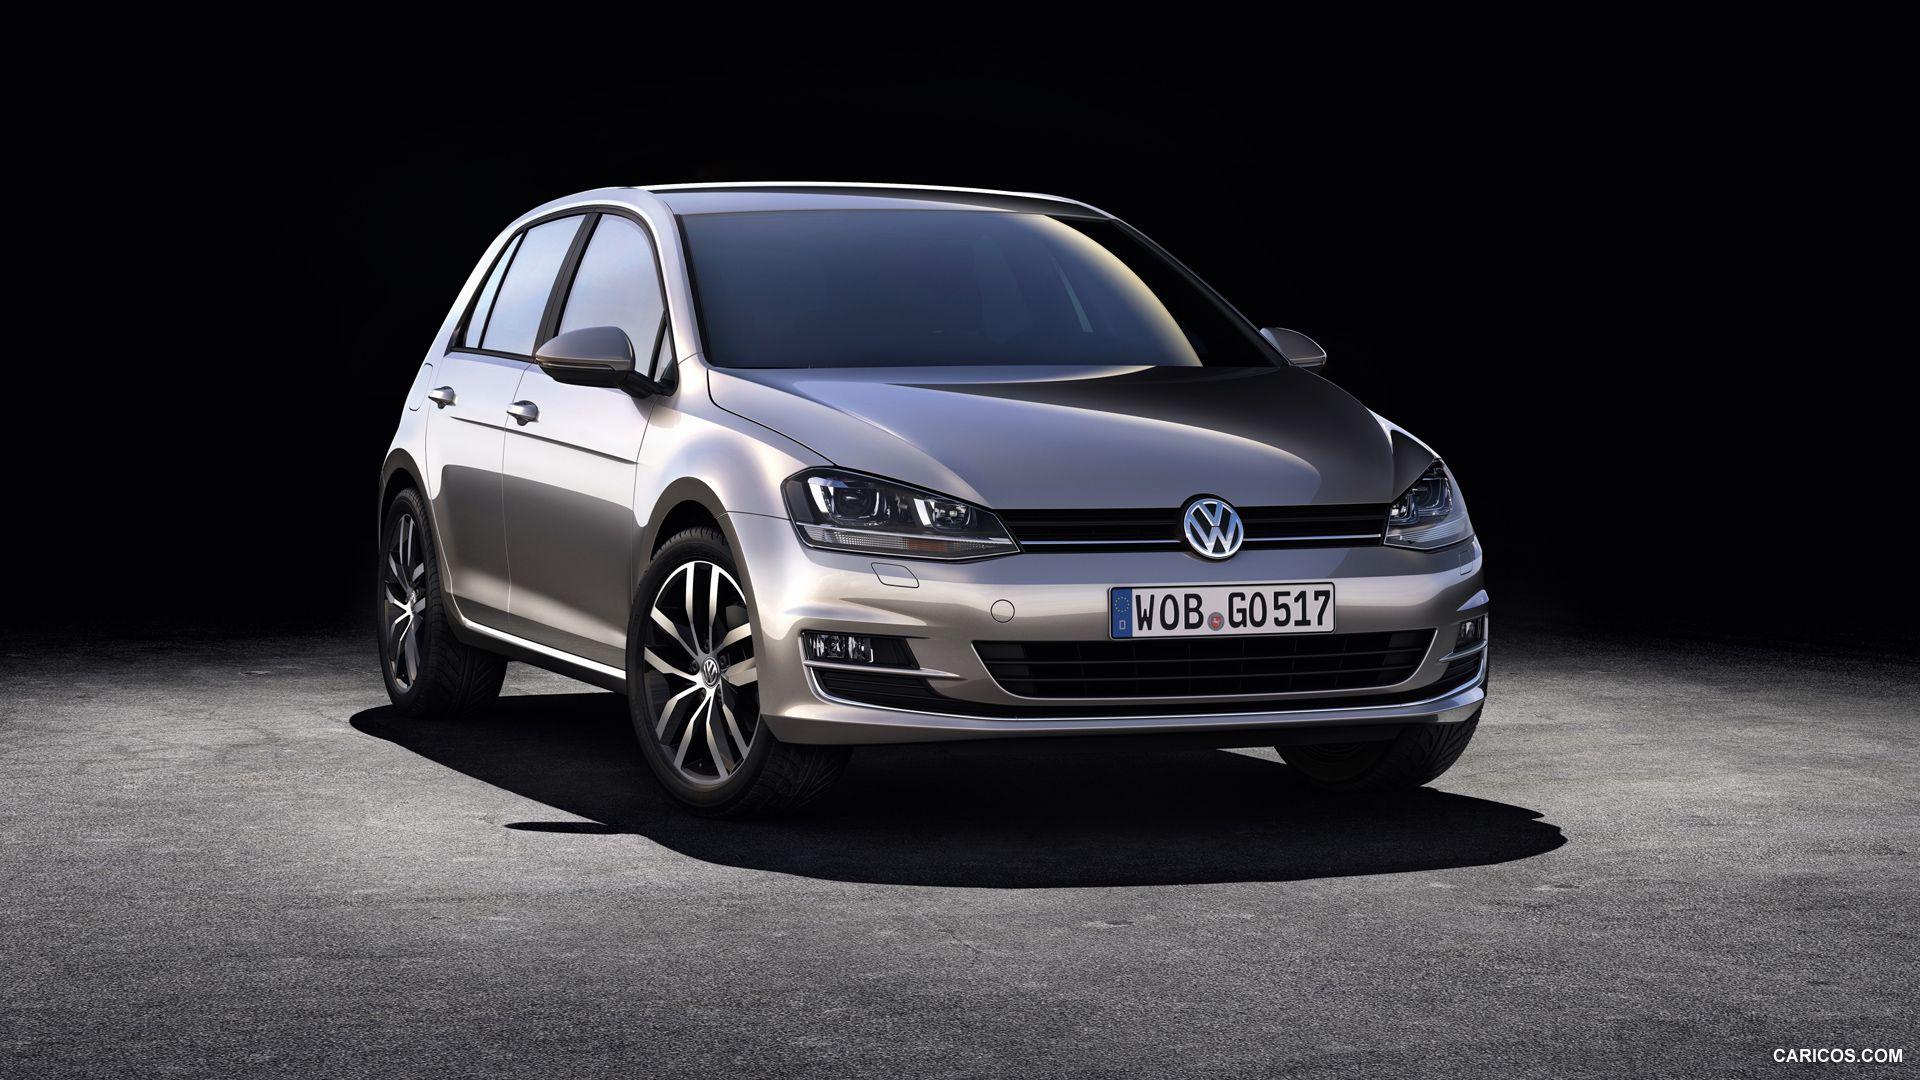 2013 Volkswagen Golf 7 Vii